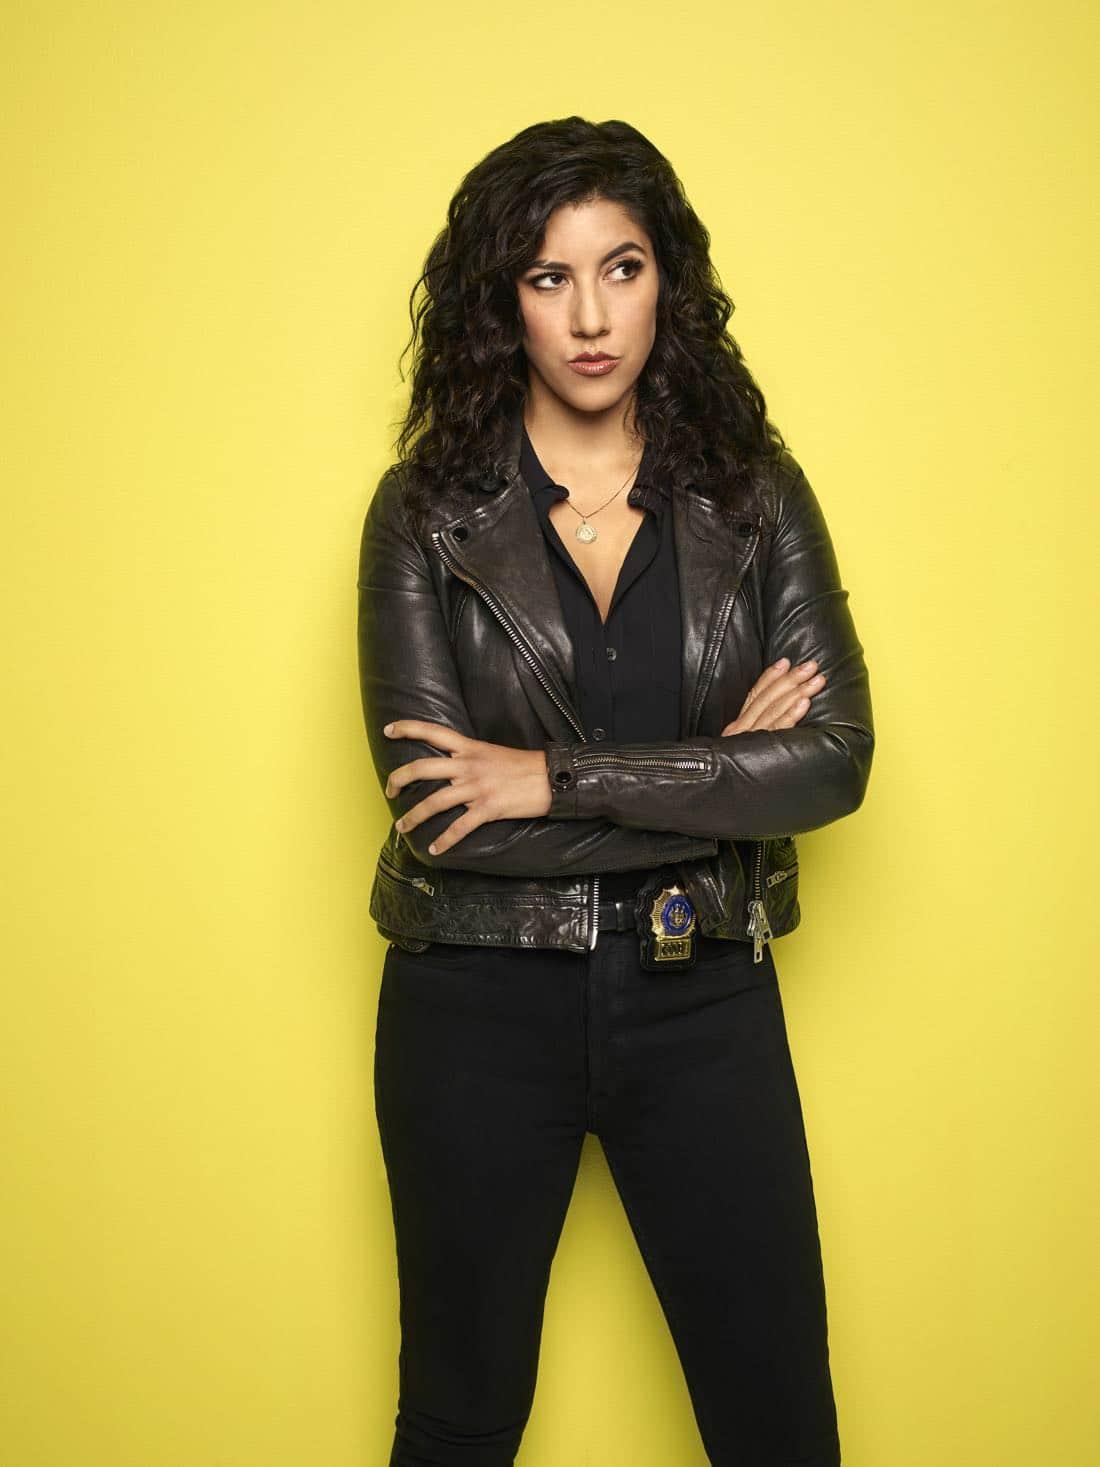 BROOKLYN NINE-NINE: Stephanie Beatriz as Detective Rosa Diaz. BROOKLYN NINE-NINE Season Five premieres Tuesday, Sept. 26 (9:30-10:00 PM ET/PT) on FOX. ©2017 Fox Broadcasting Co. CR: Robert Trachtenberg/FOX